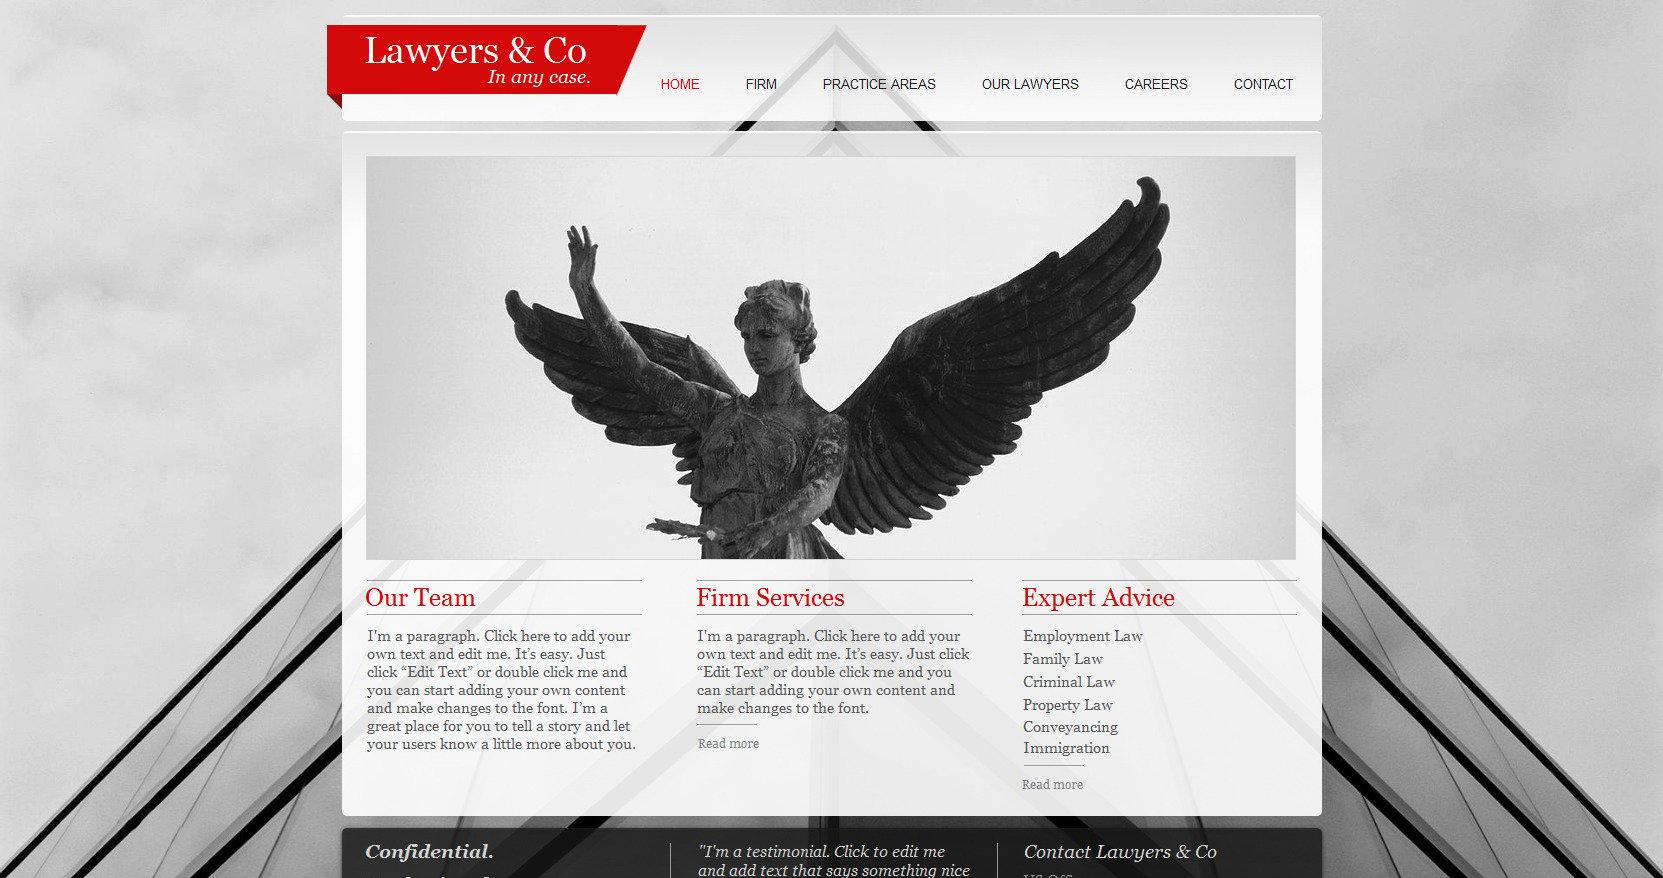 law firm wix website template 47286. Black Bedroom Furniture Sets. Home Design Ideas